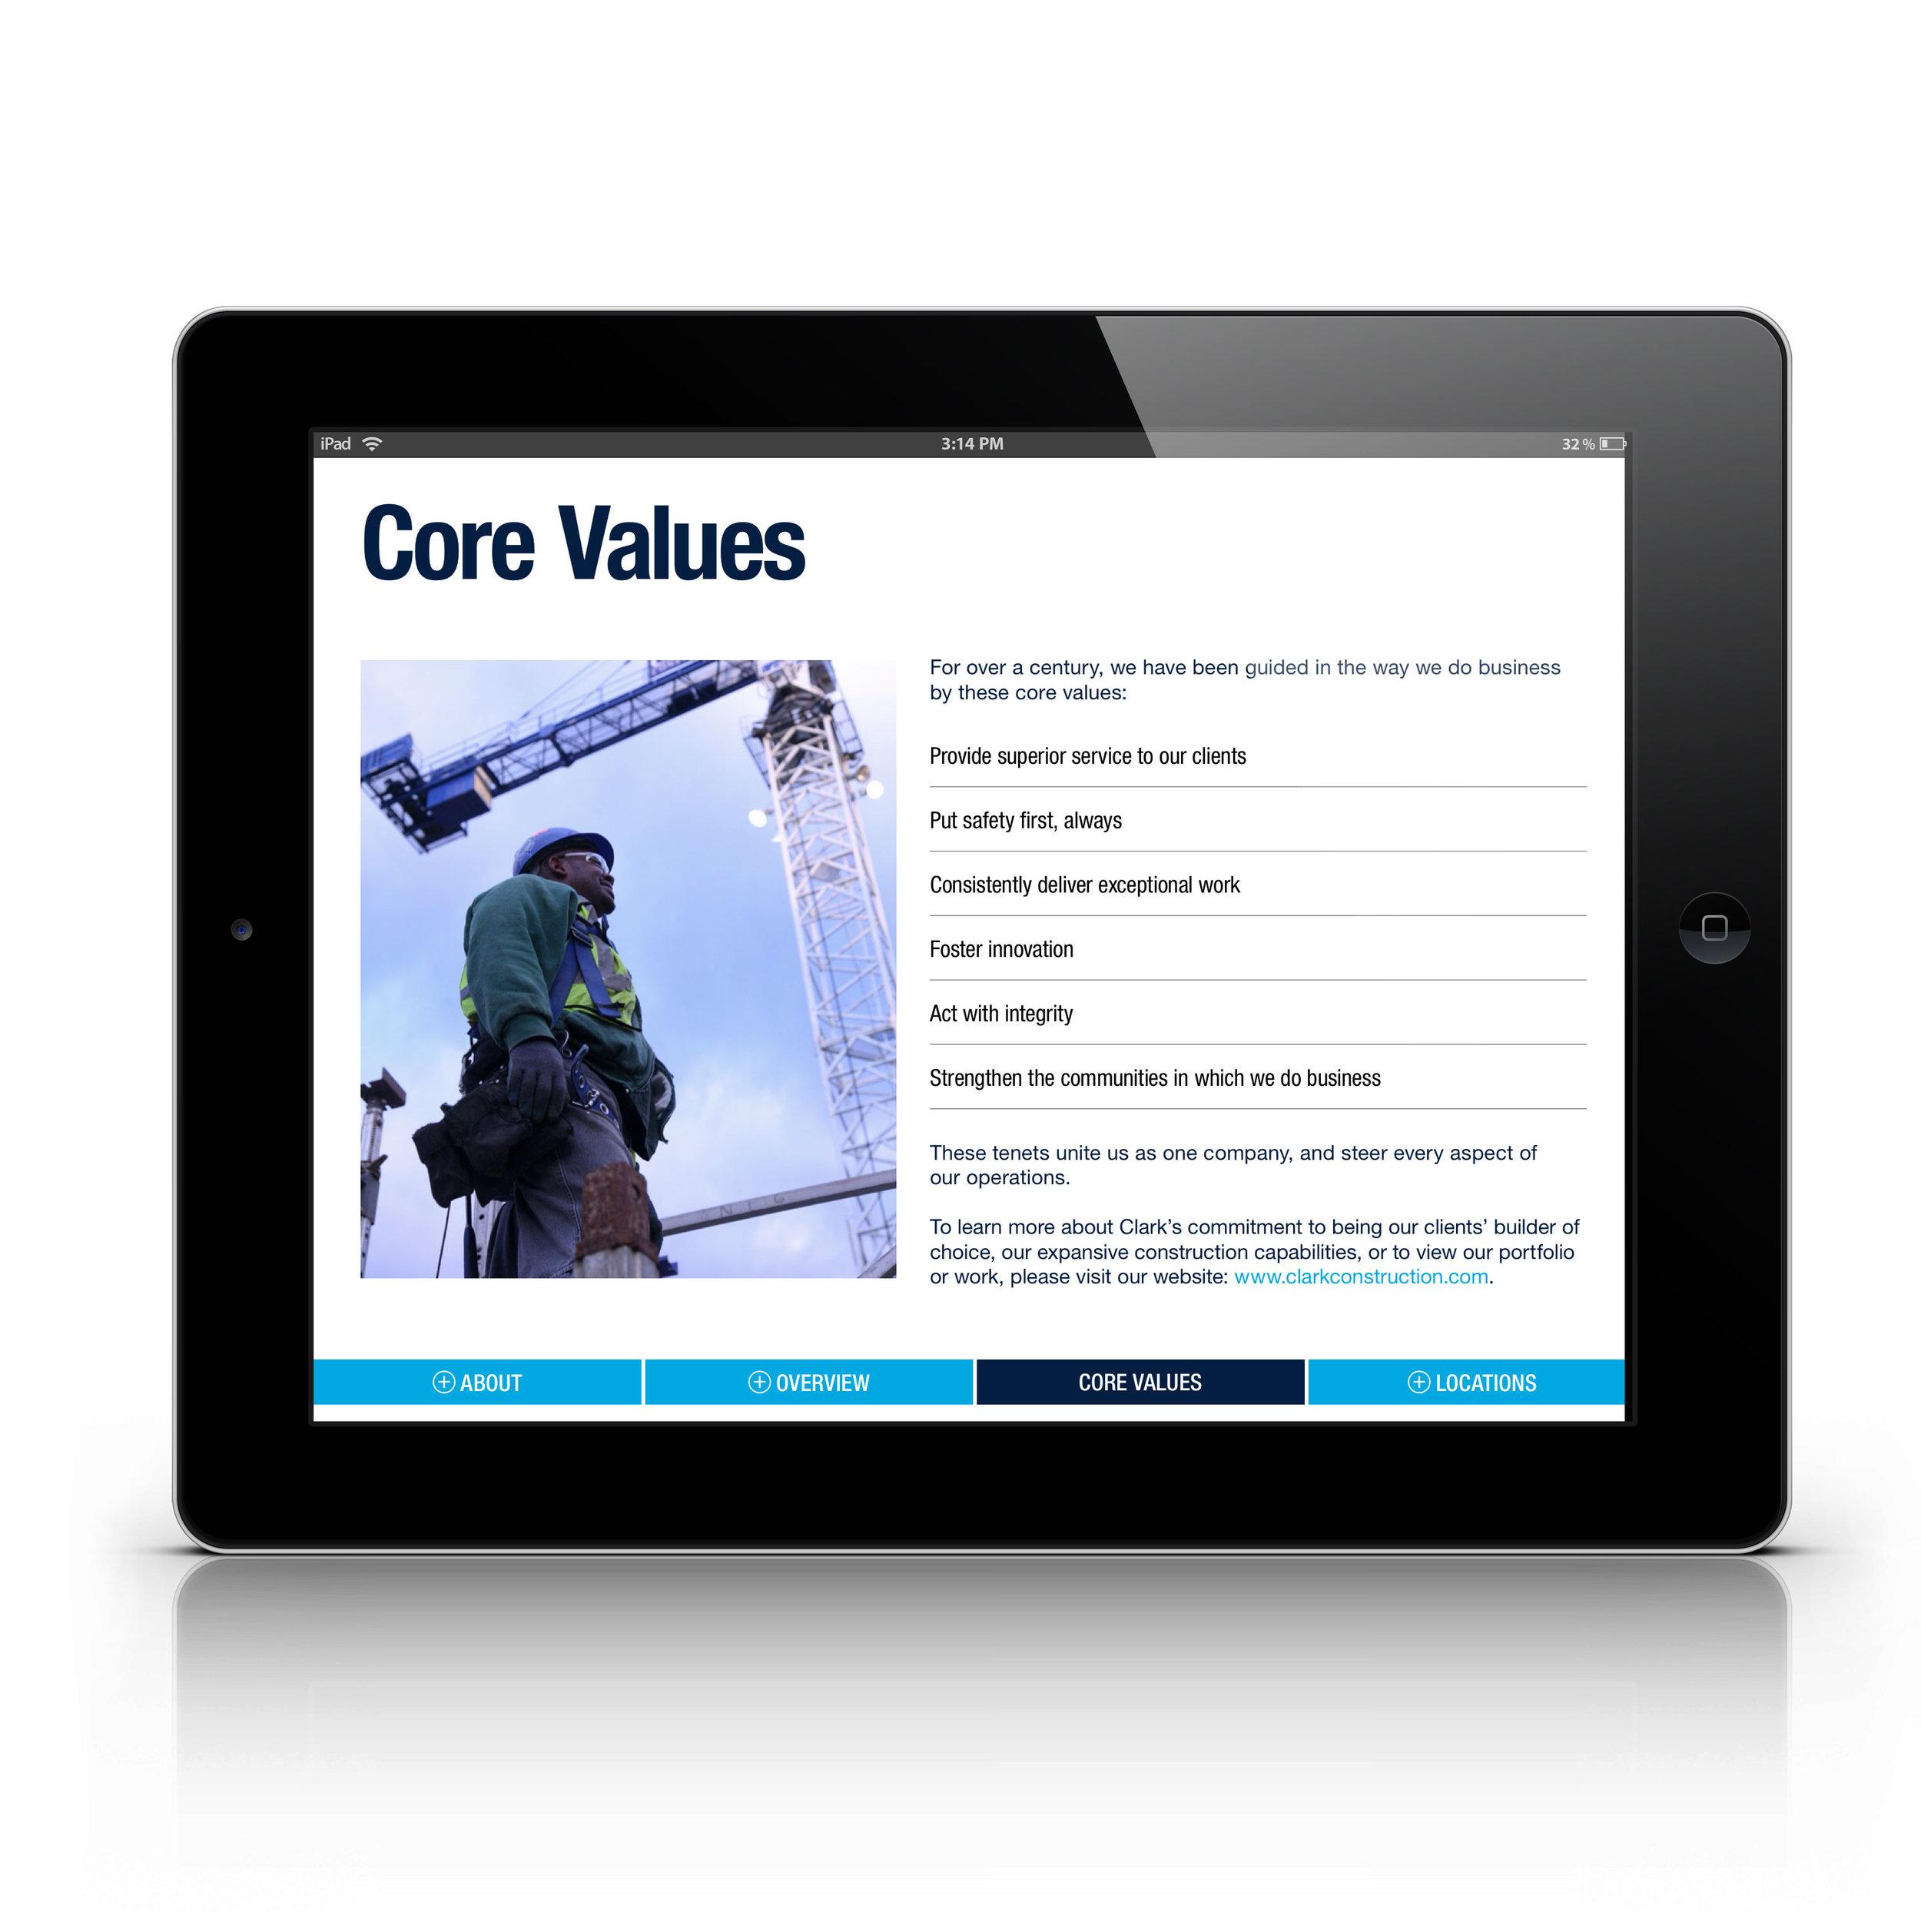 3clark-iPad-Landscape-Retina-Display-Mockup.jpg